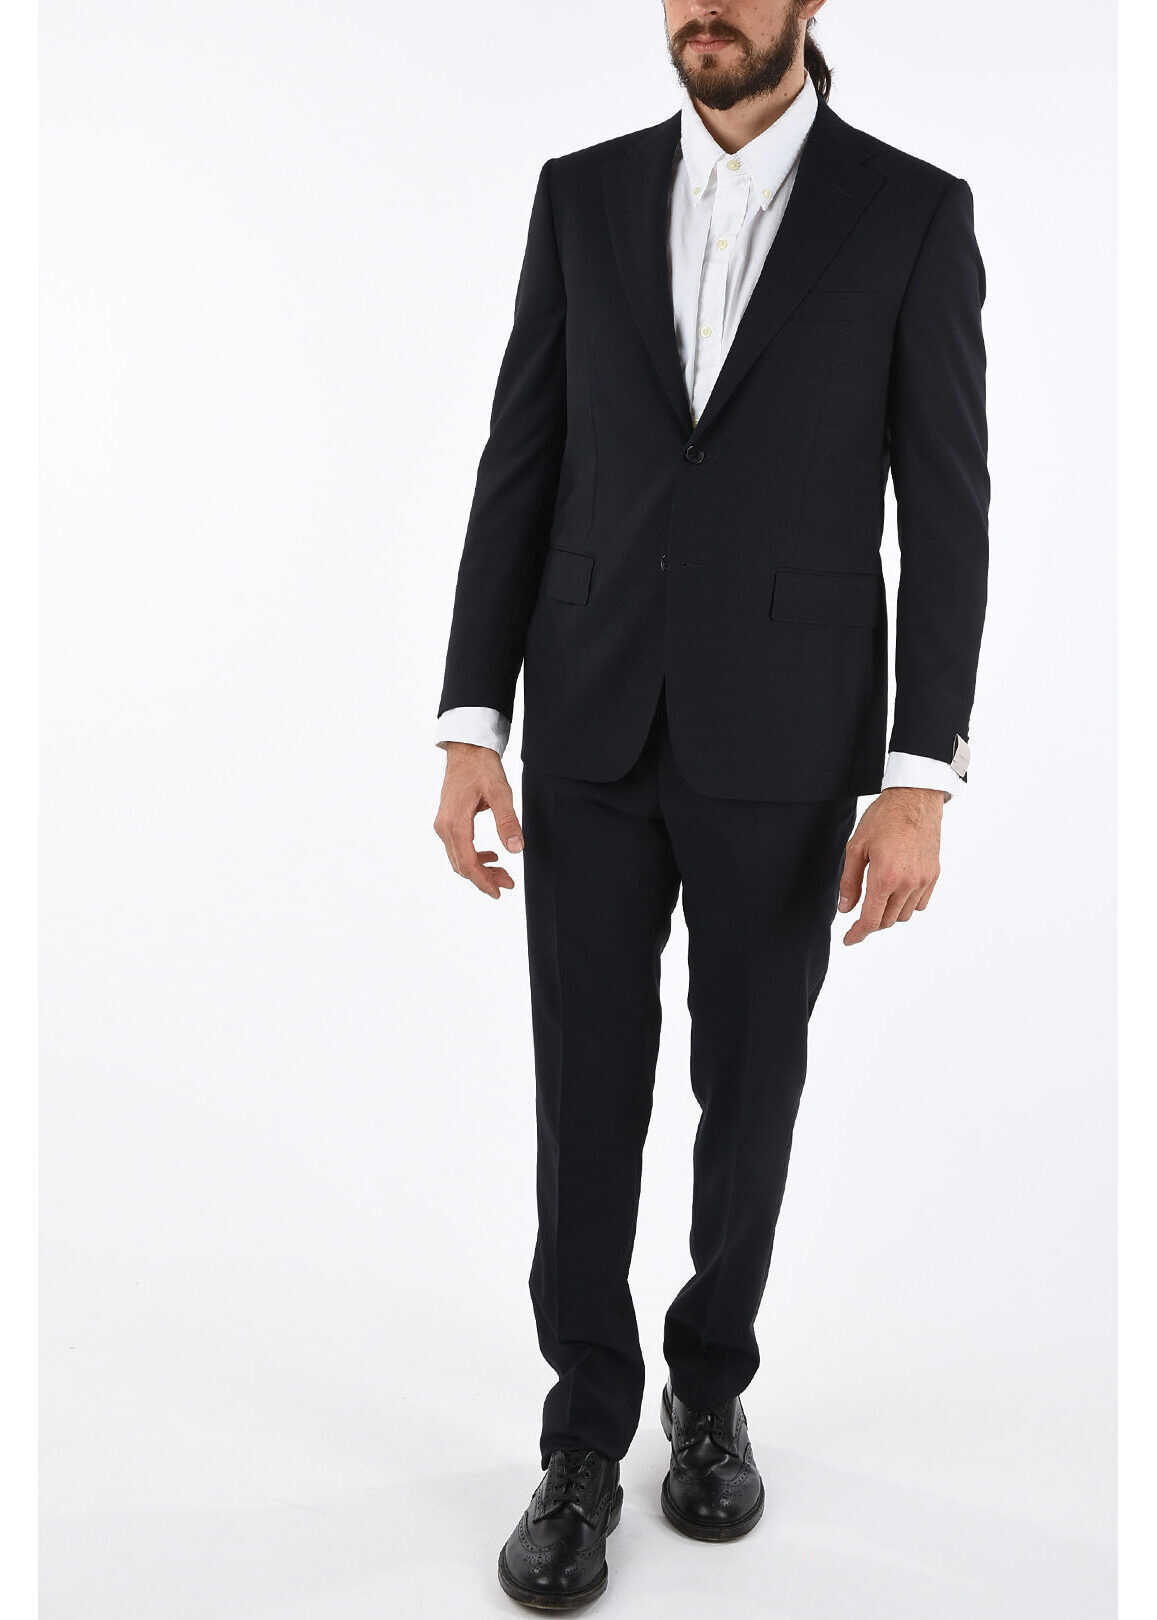 CORNELIANI MANTUA overcheck twill super 180's 2-button suit BLUE imagine